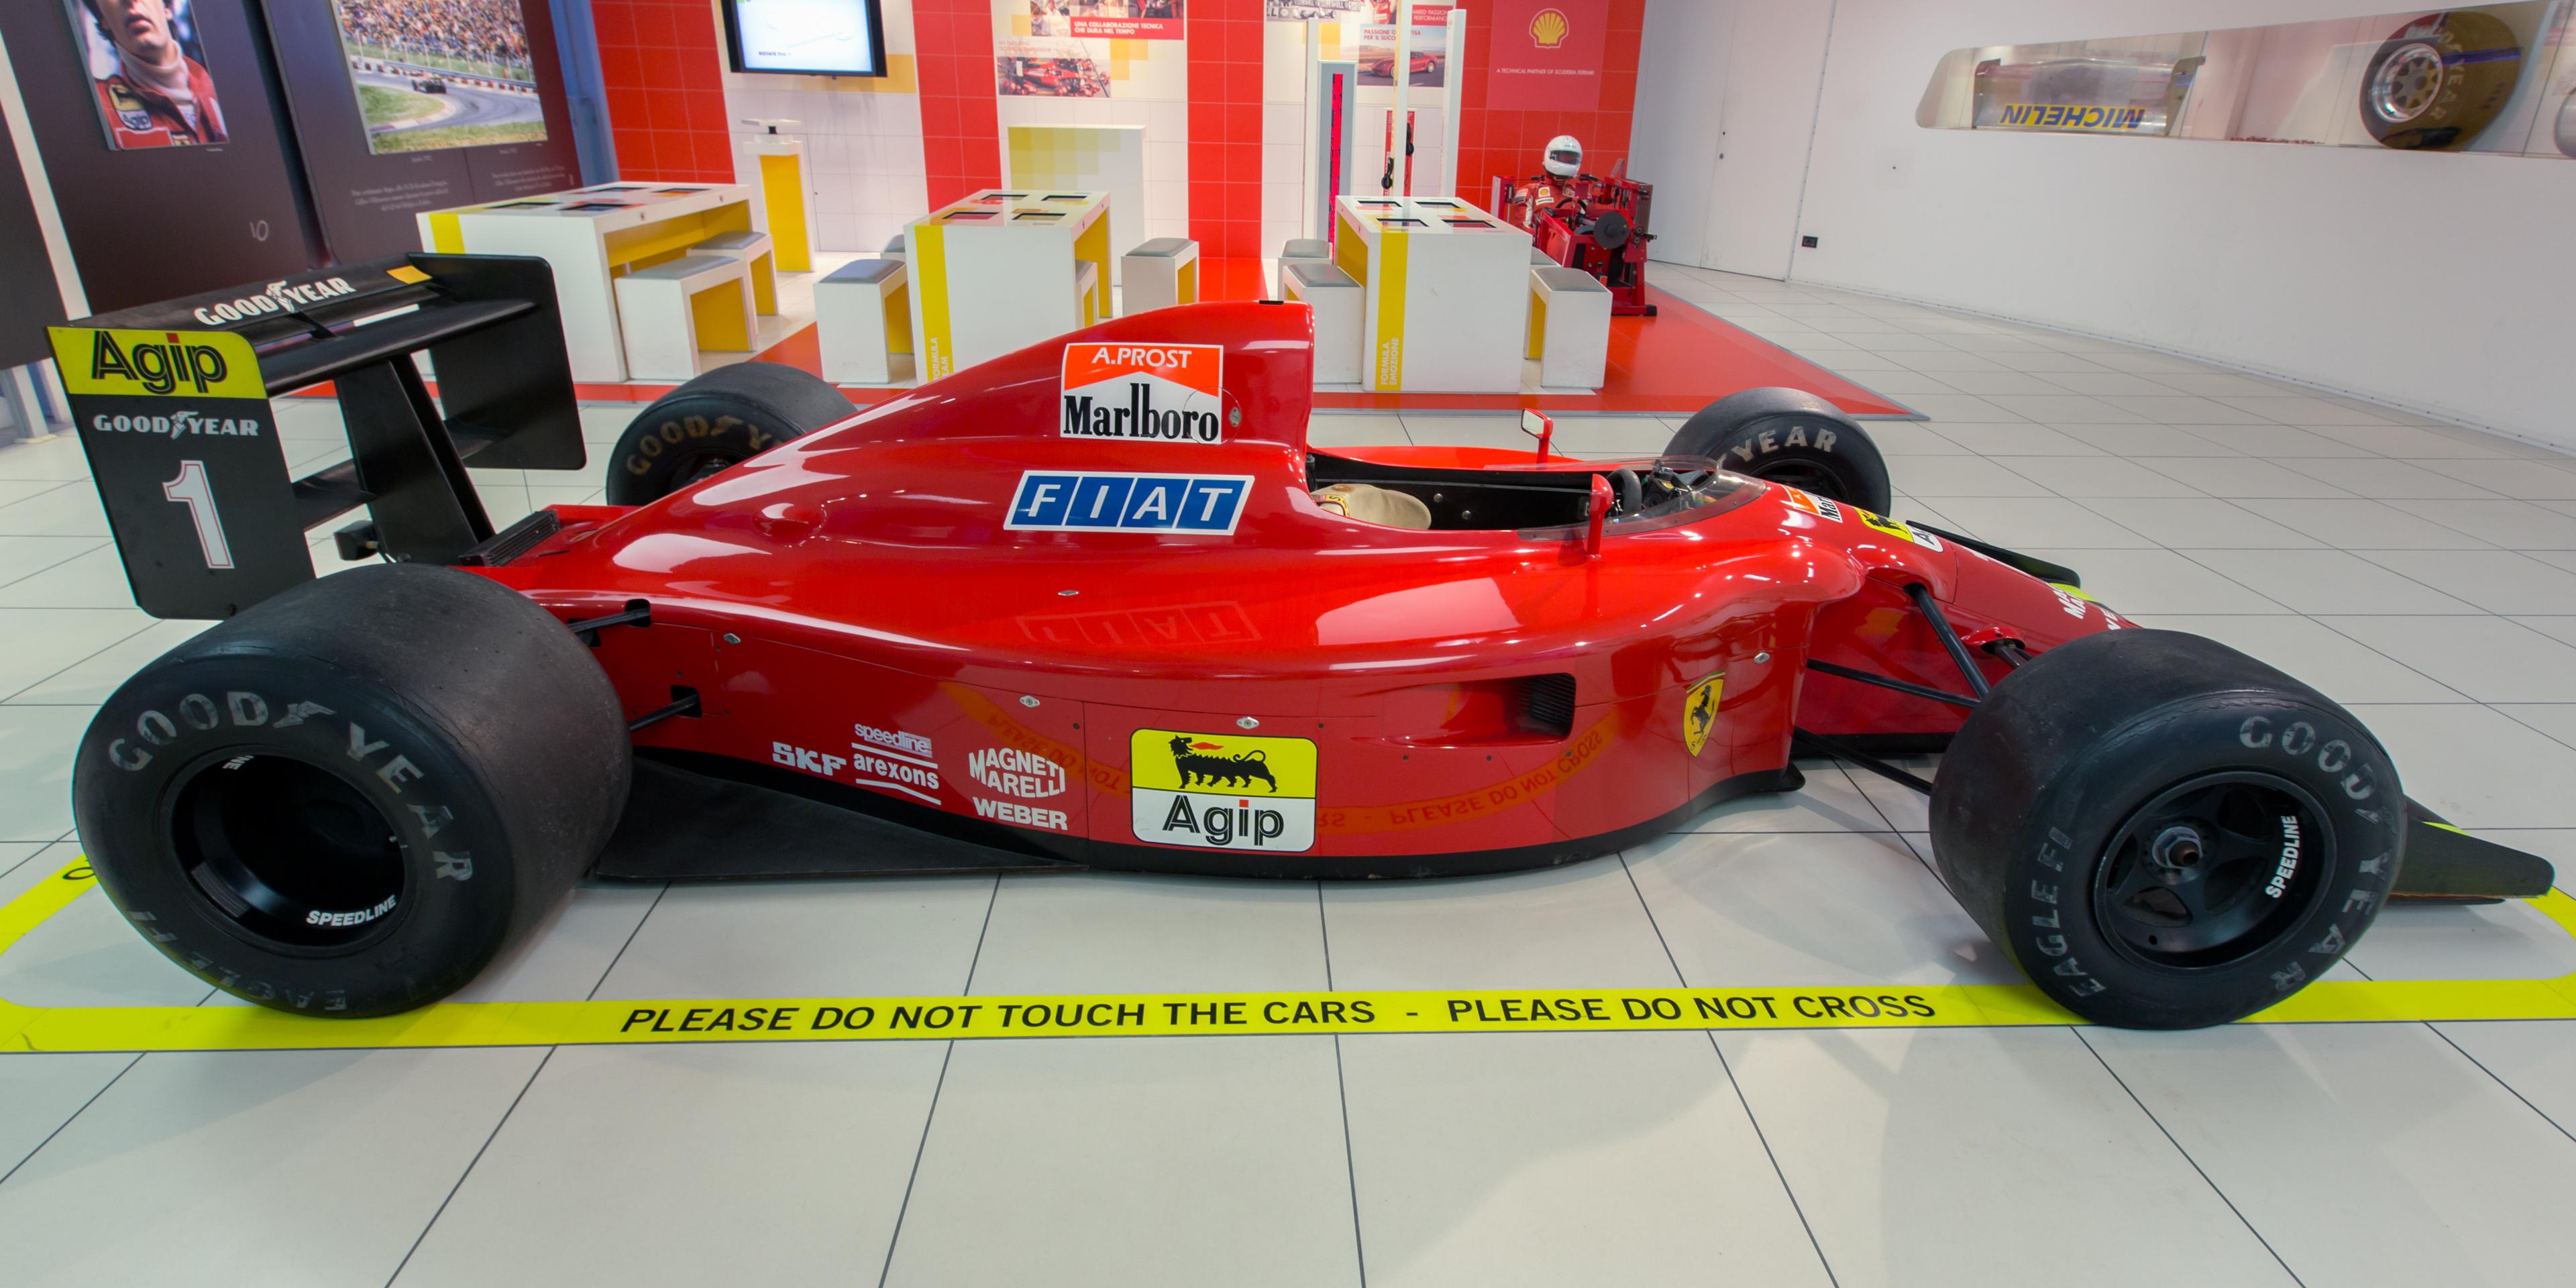 Ferrari_641-2_right_Museo_Ferrari.jpg